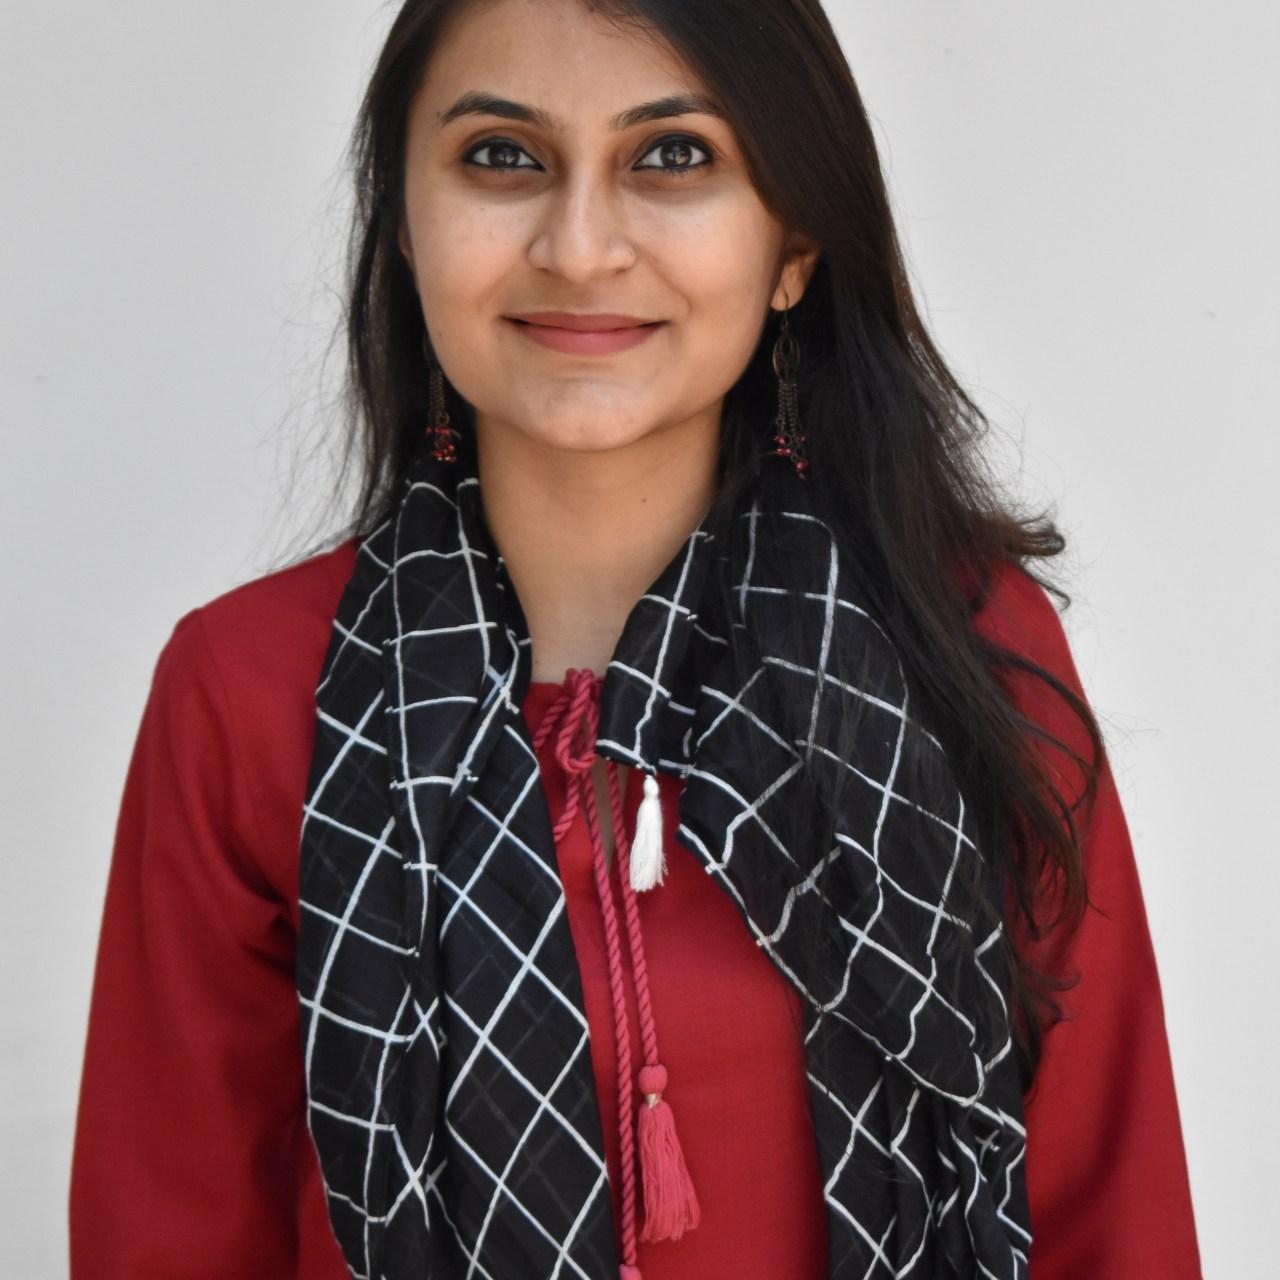 https://i1.wp.com/truhap.com/wp-content/uploads/2020/11/Shivani-Wadhwa.jpg?resize=1280%2C1280&ssl=1